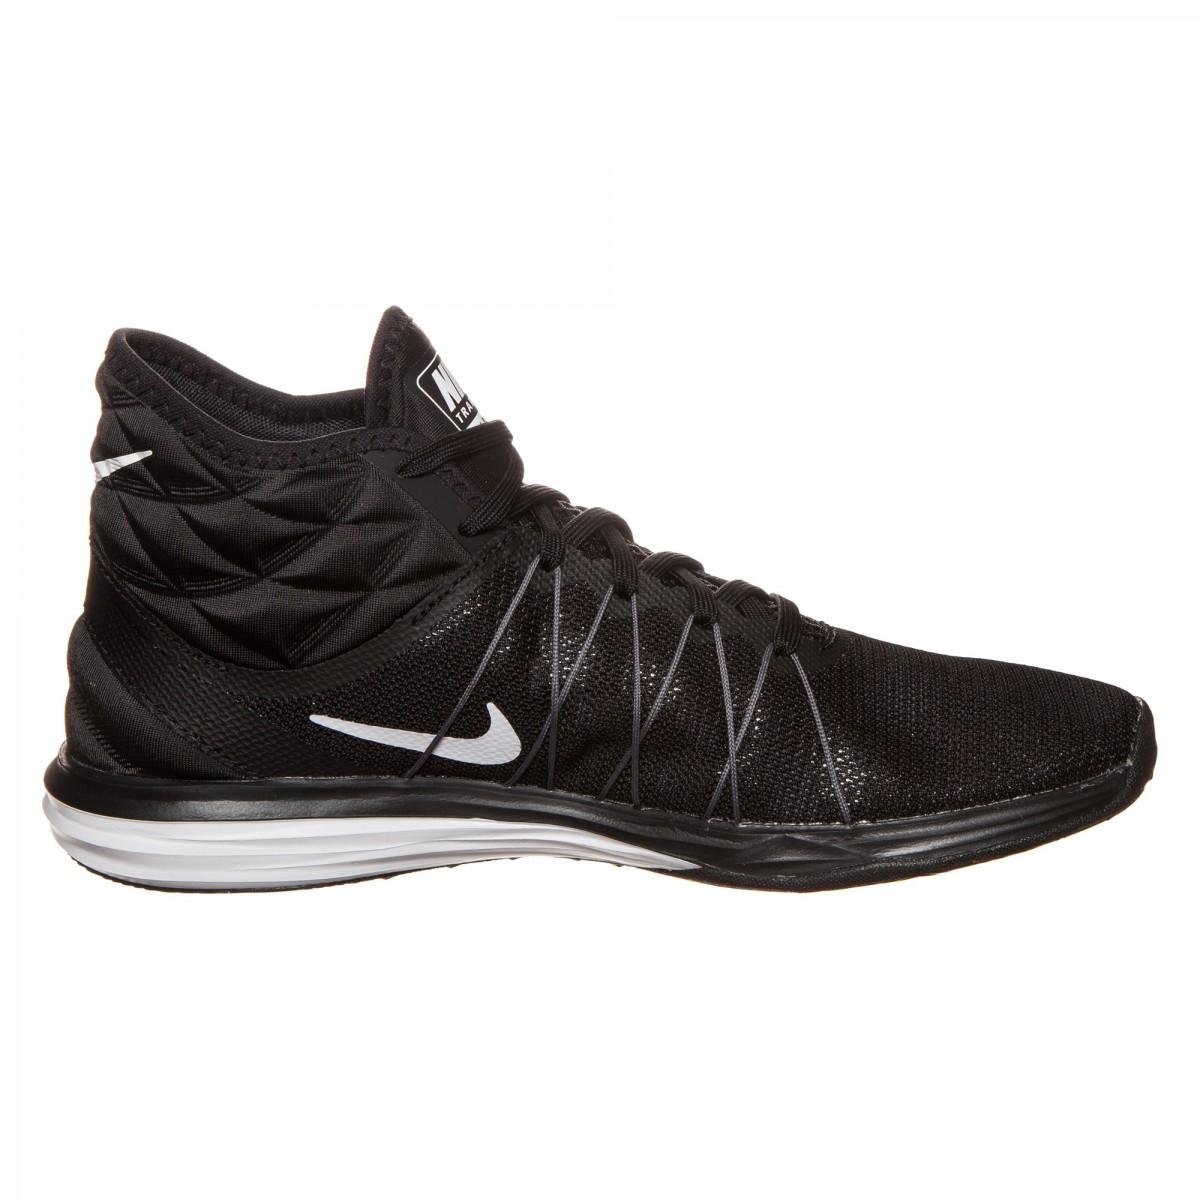 ef4ce29f2 Bizz Store - Tênis Feminino Nike Dual Fusion TR Hit Mid Preto